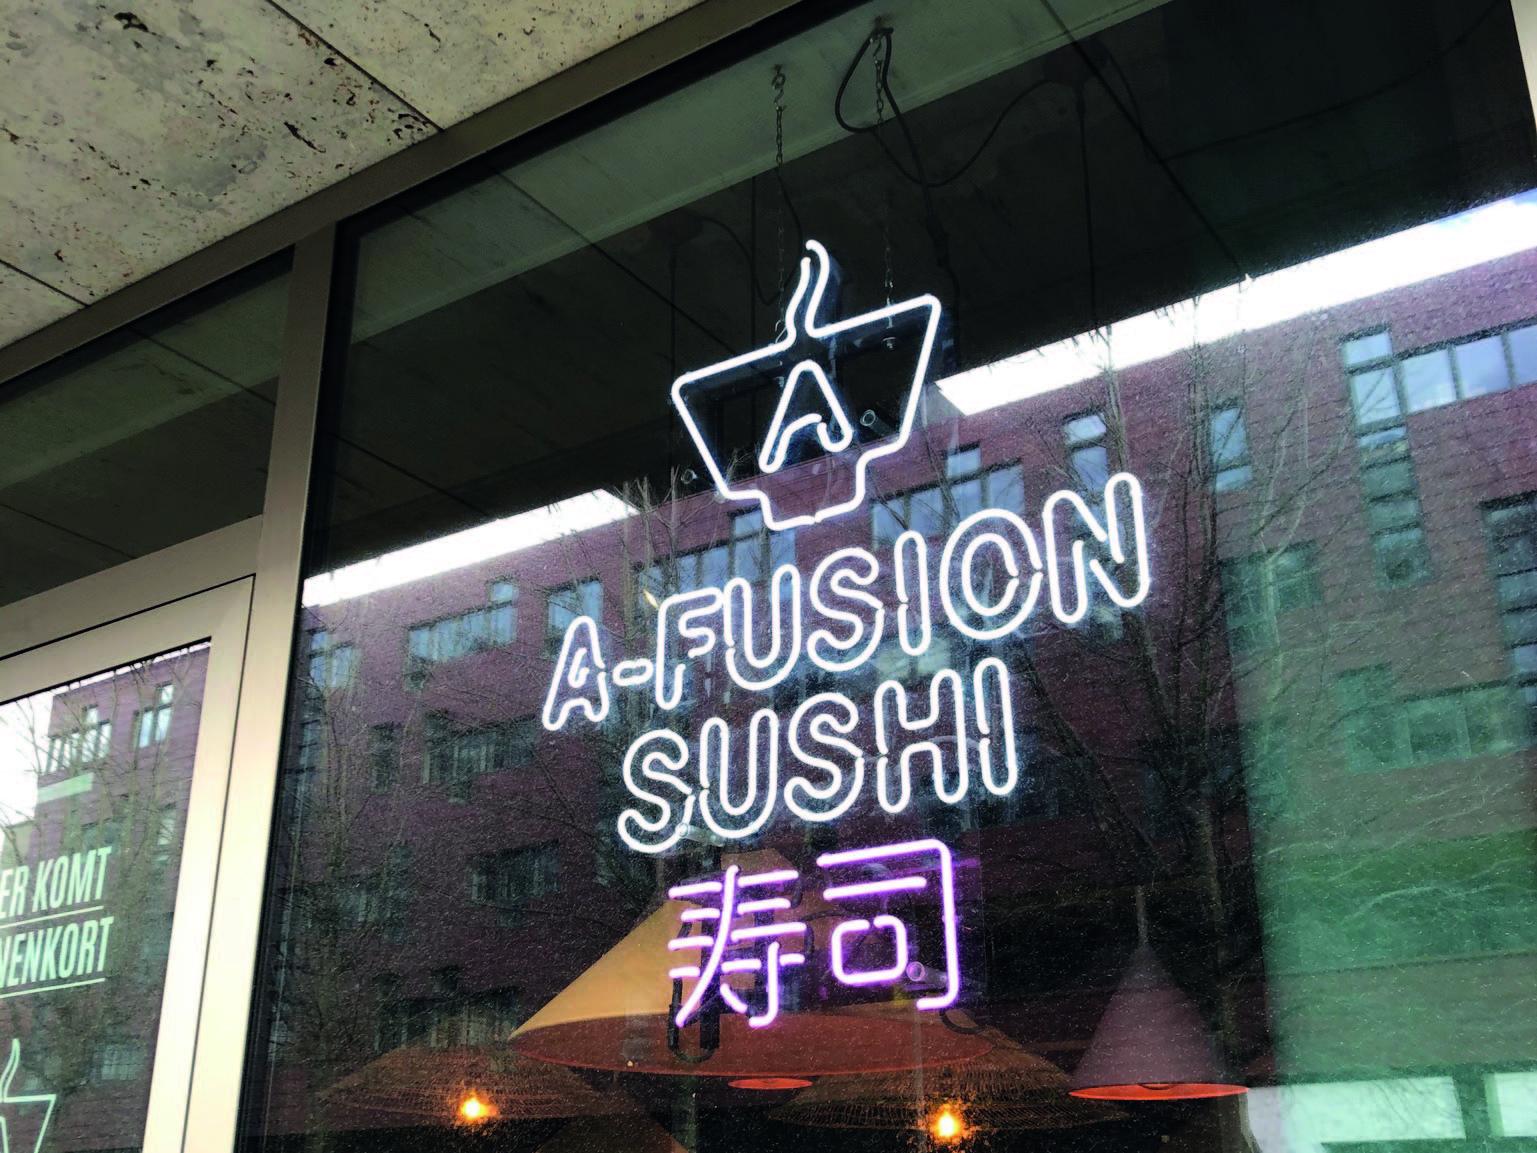 AFusion